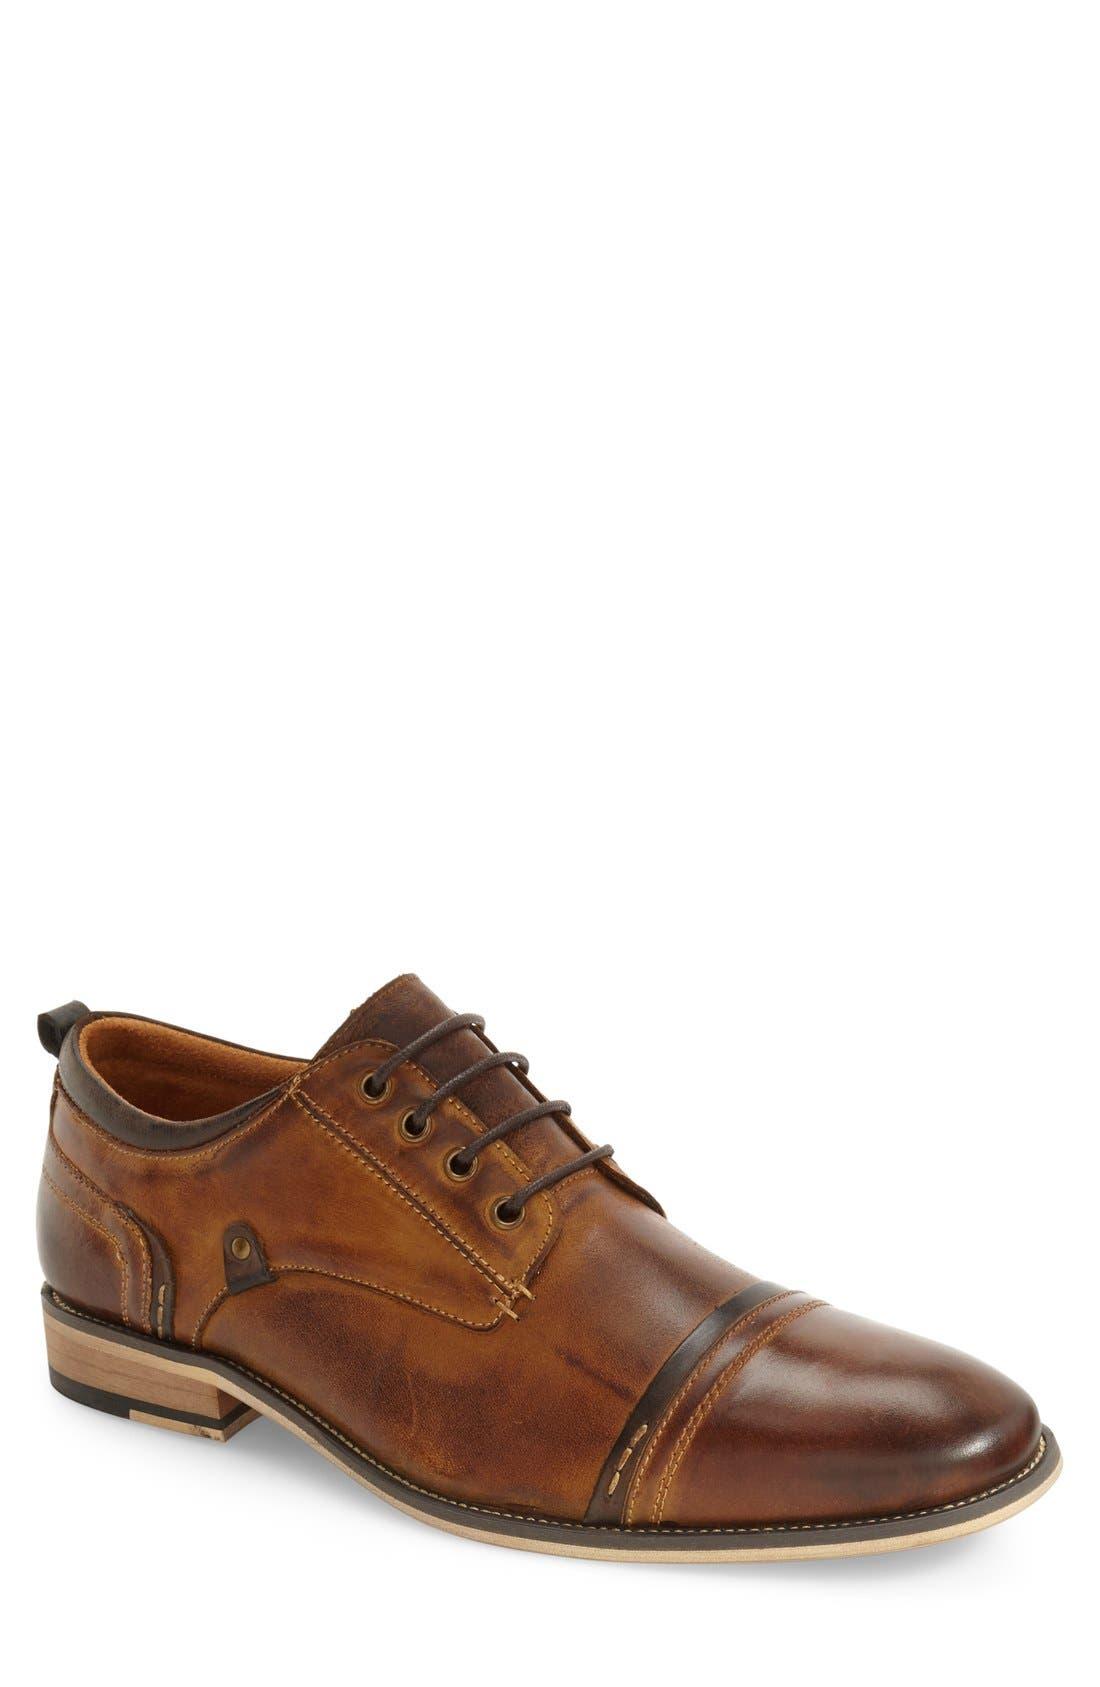 Jamyson Cap Toe Derby,                         Main,                         color, Tan Leather